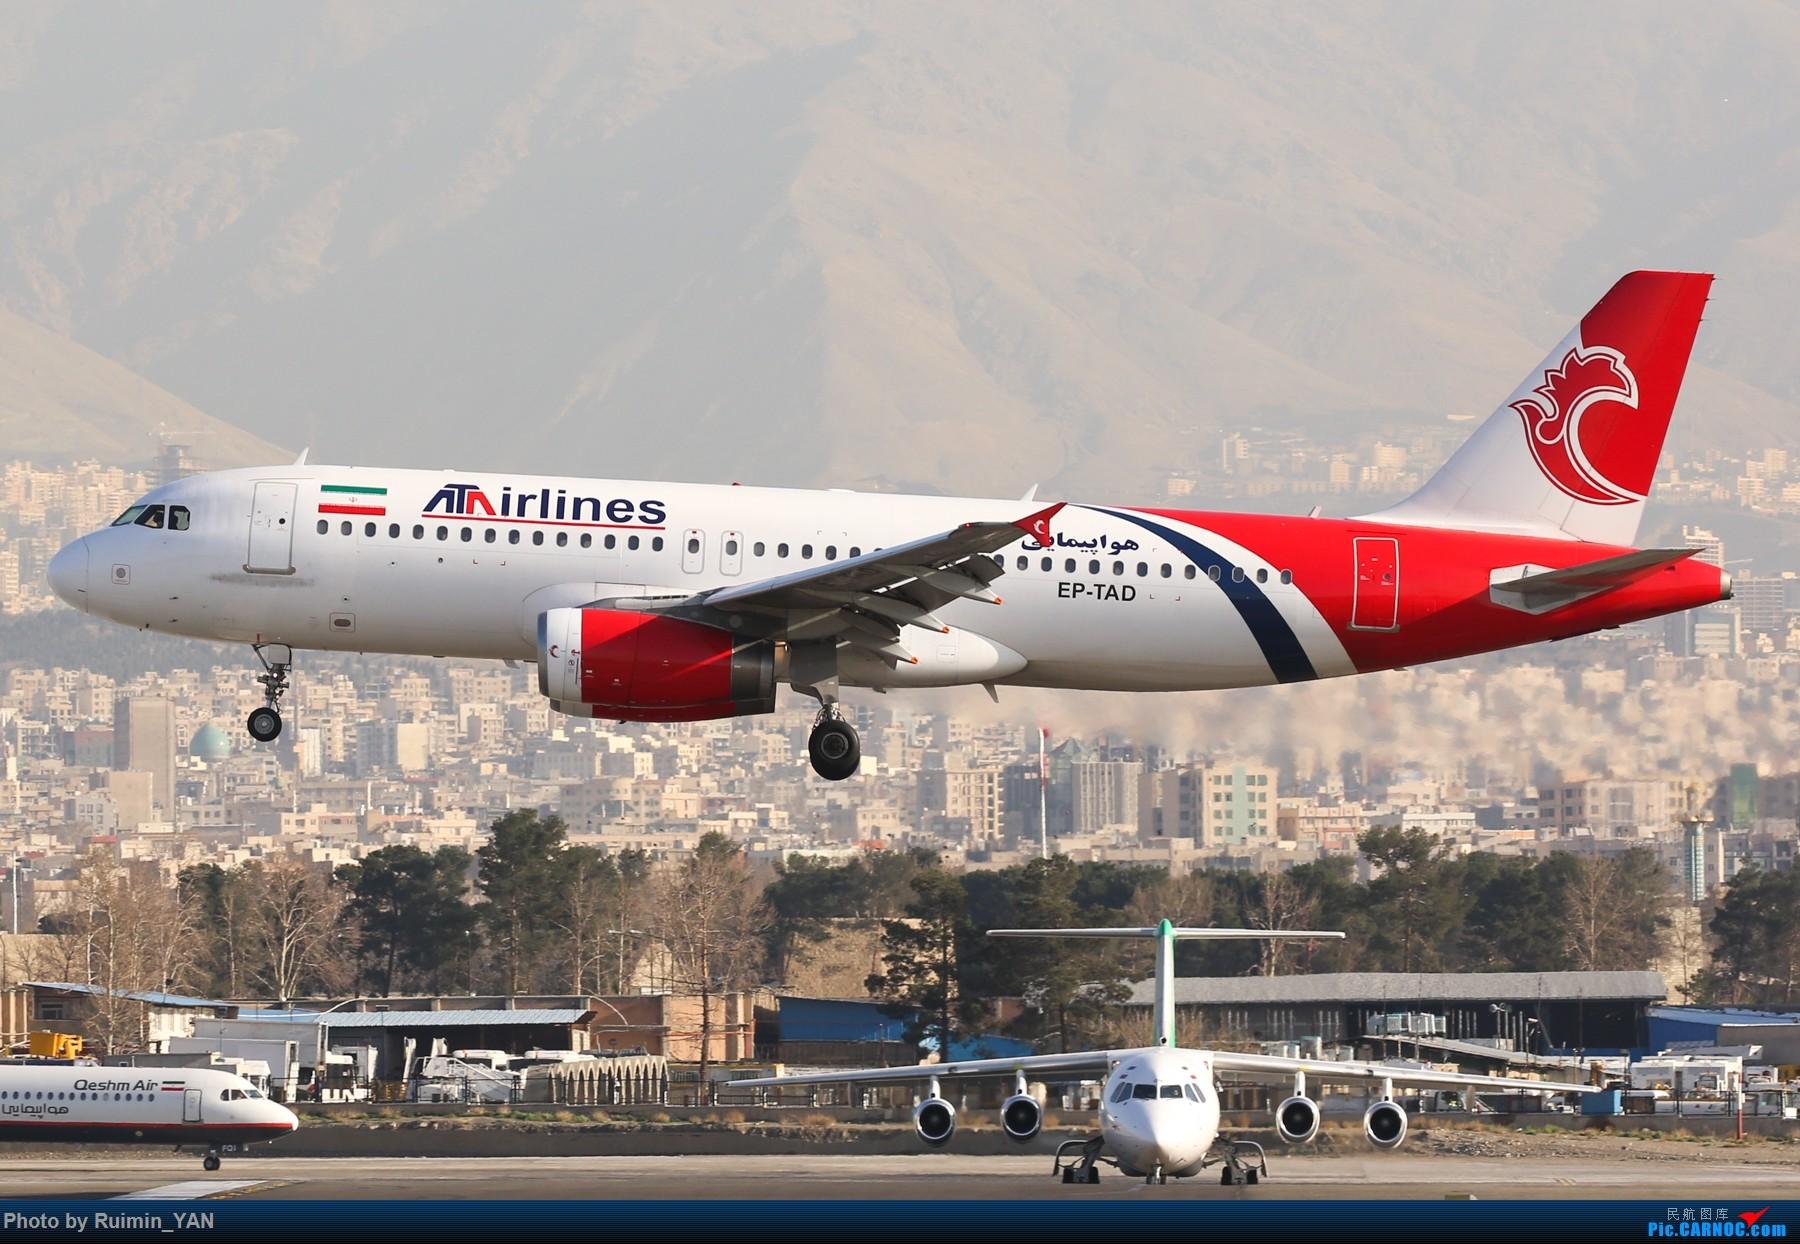 Re:[原创]【THR】(德黑兰梅赫拉巴德机场)伊朗ATA航空(ATA Airlines)--320 AIRBUS A320-200 EP-TAD 德黑兰梅赫拉巴德国际机场